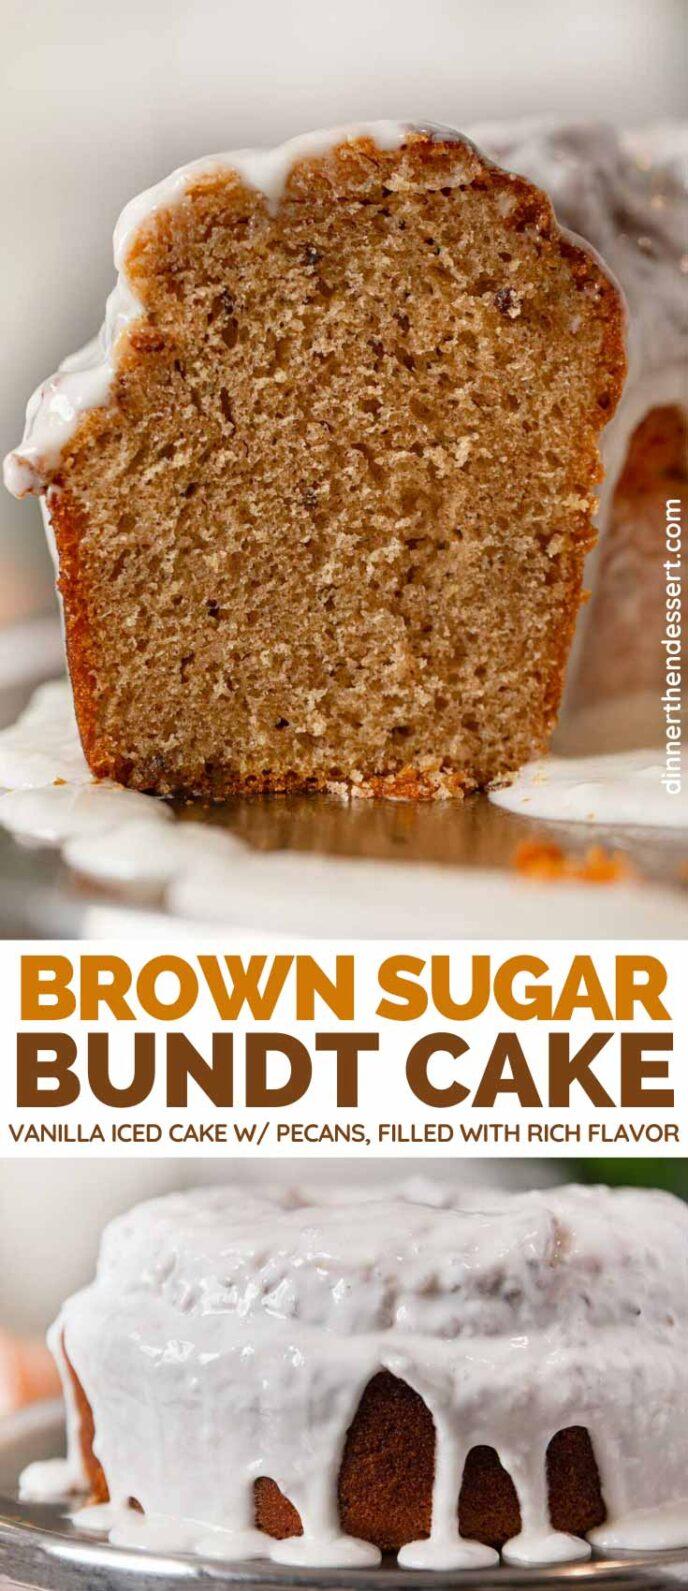 Brown Sugar Bundt Cake collage